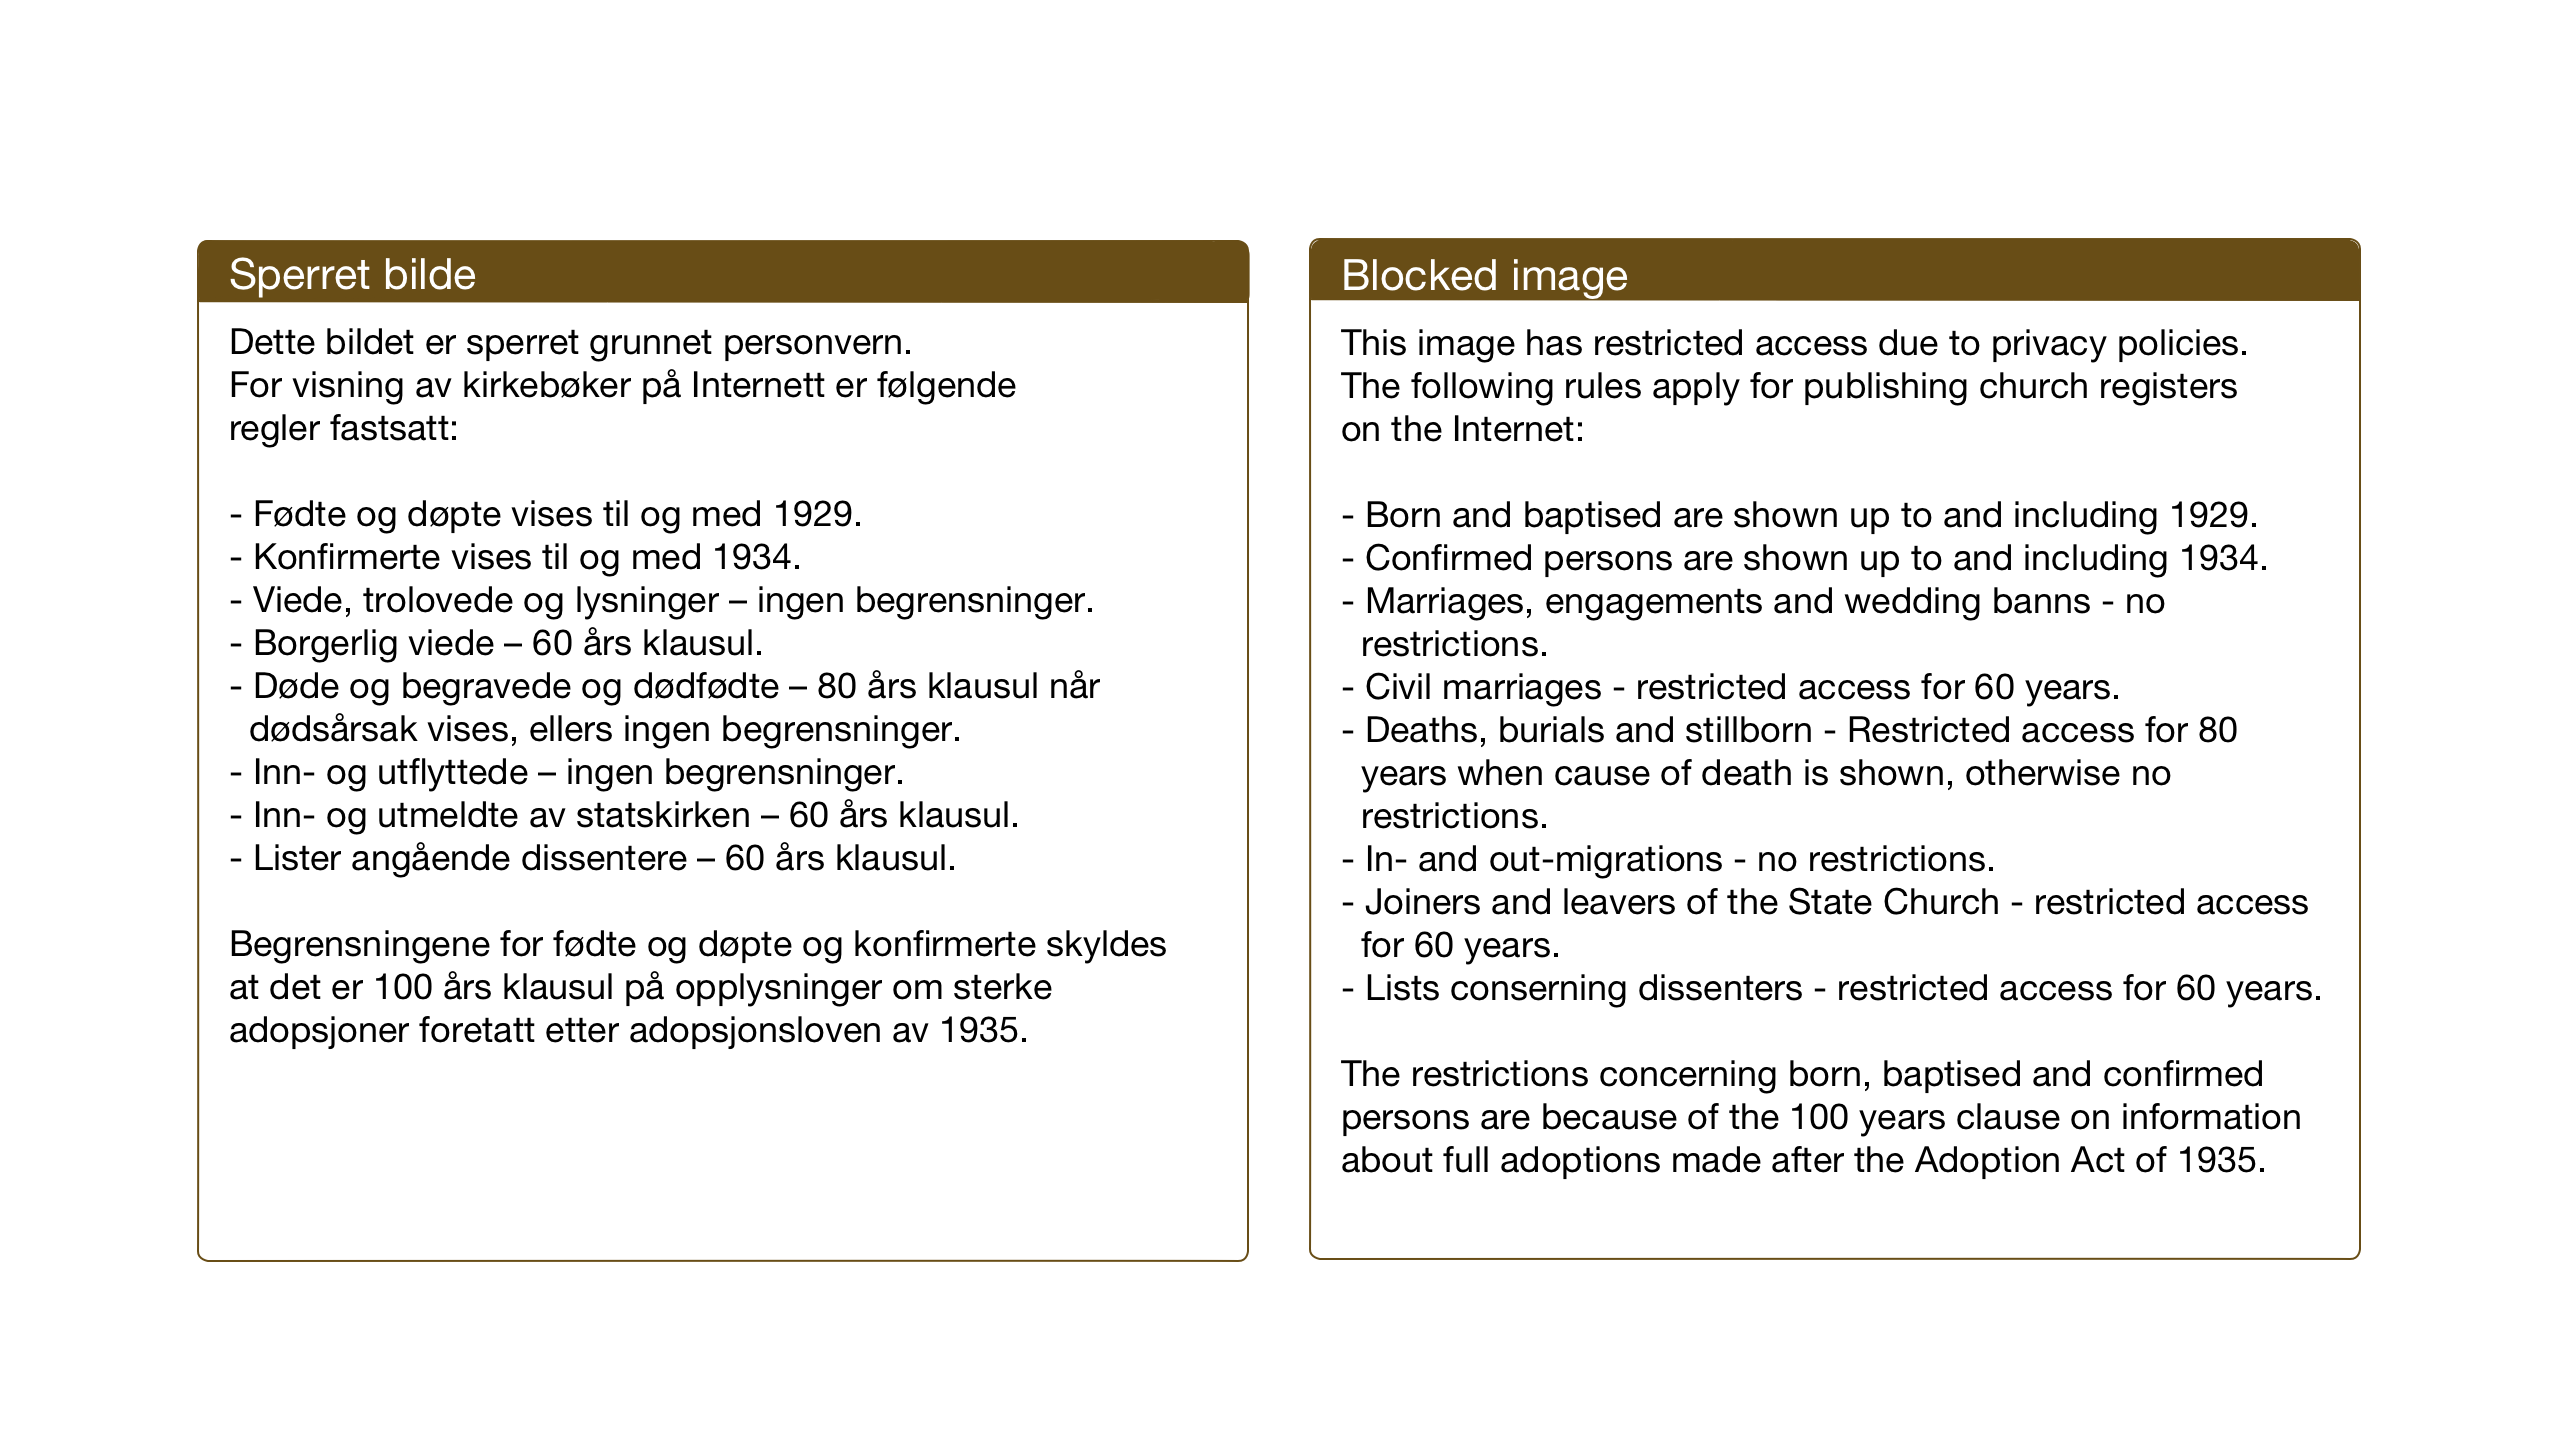 SAT, Ministerialprotokoller, klokkerbøker og fødselsregistre - Nordland, 847/L0680: Klokkerbok nr. 847C08, 1930-1947, s. 202